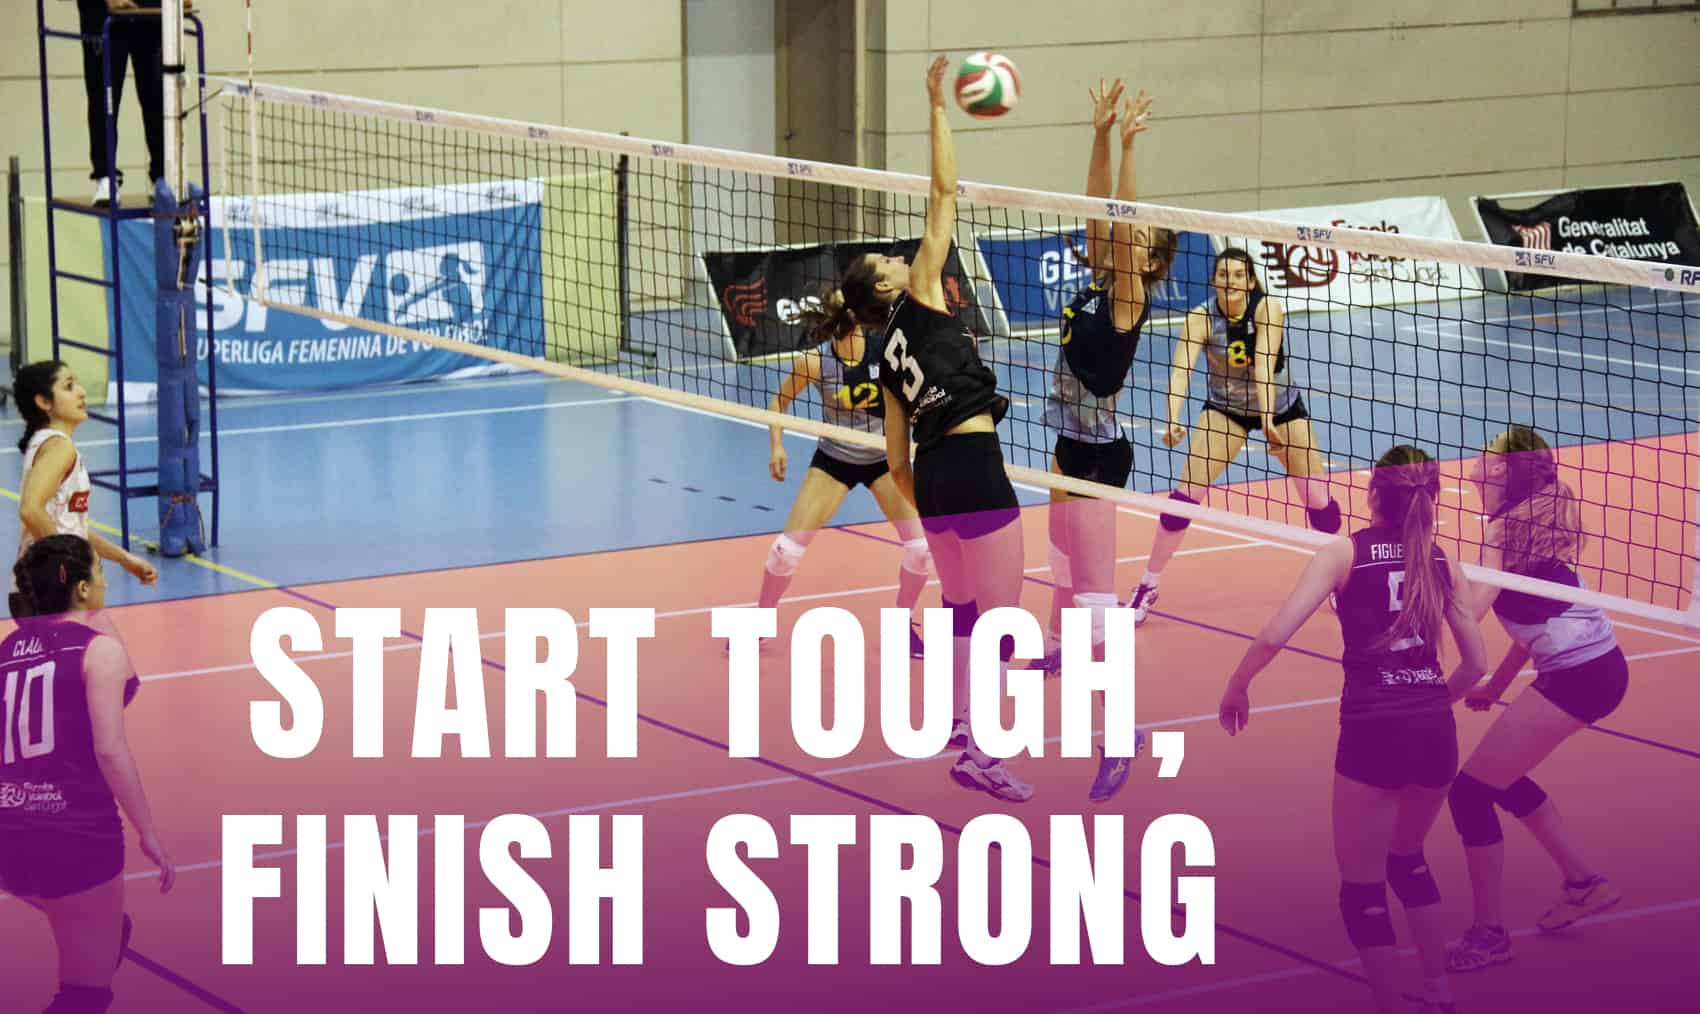 start tough finish strong